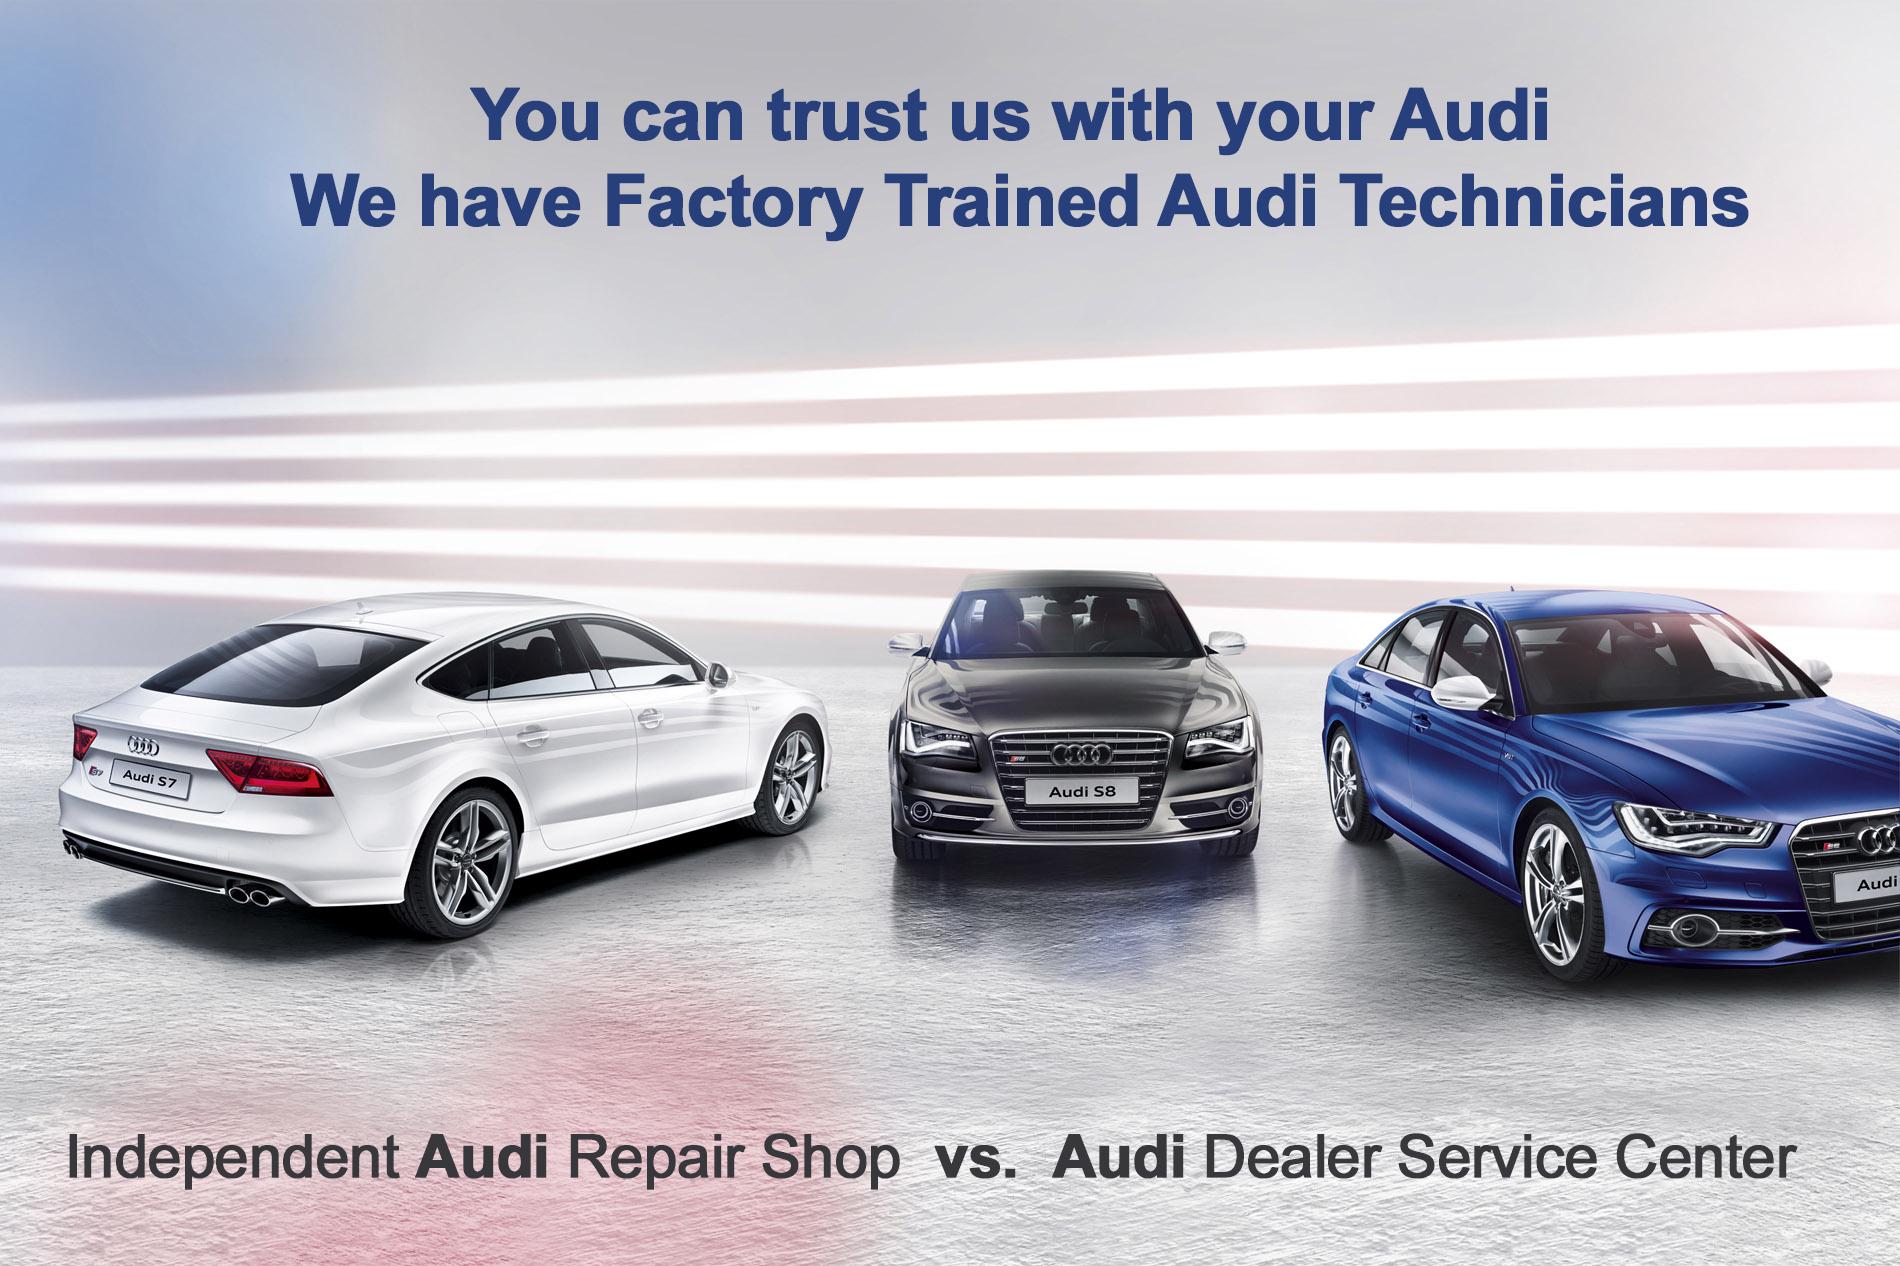 Bmw Specialist Near Me >> Independent Audi Greensboro Shop vs. Audi Dealer Service Center Greensboro, NC